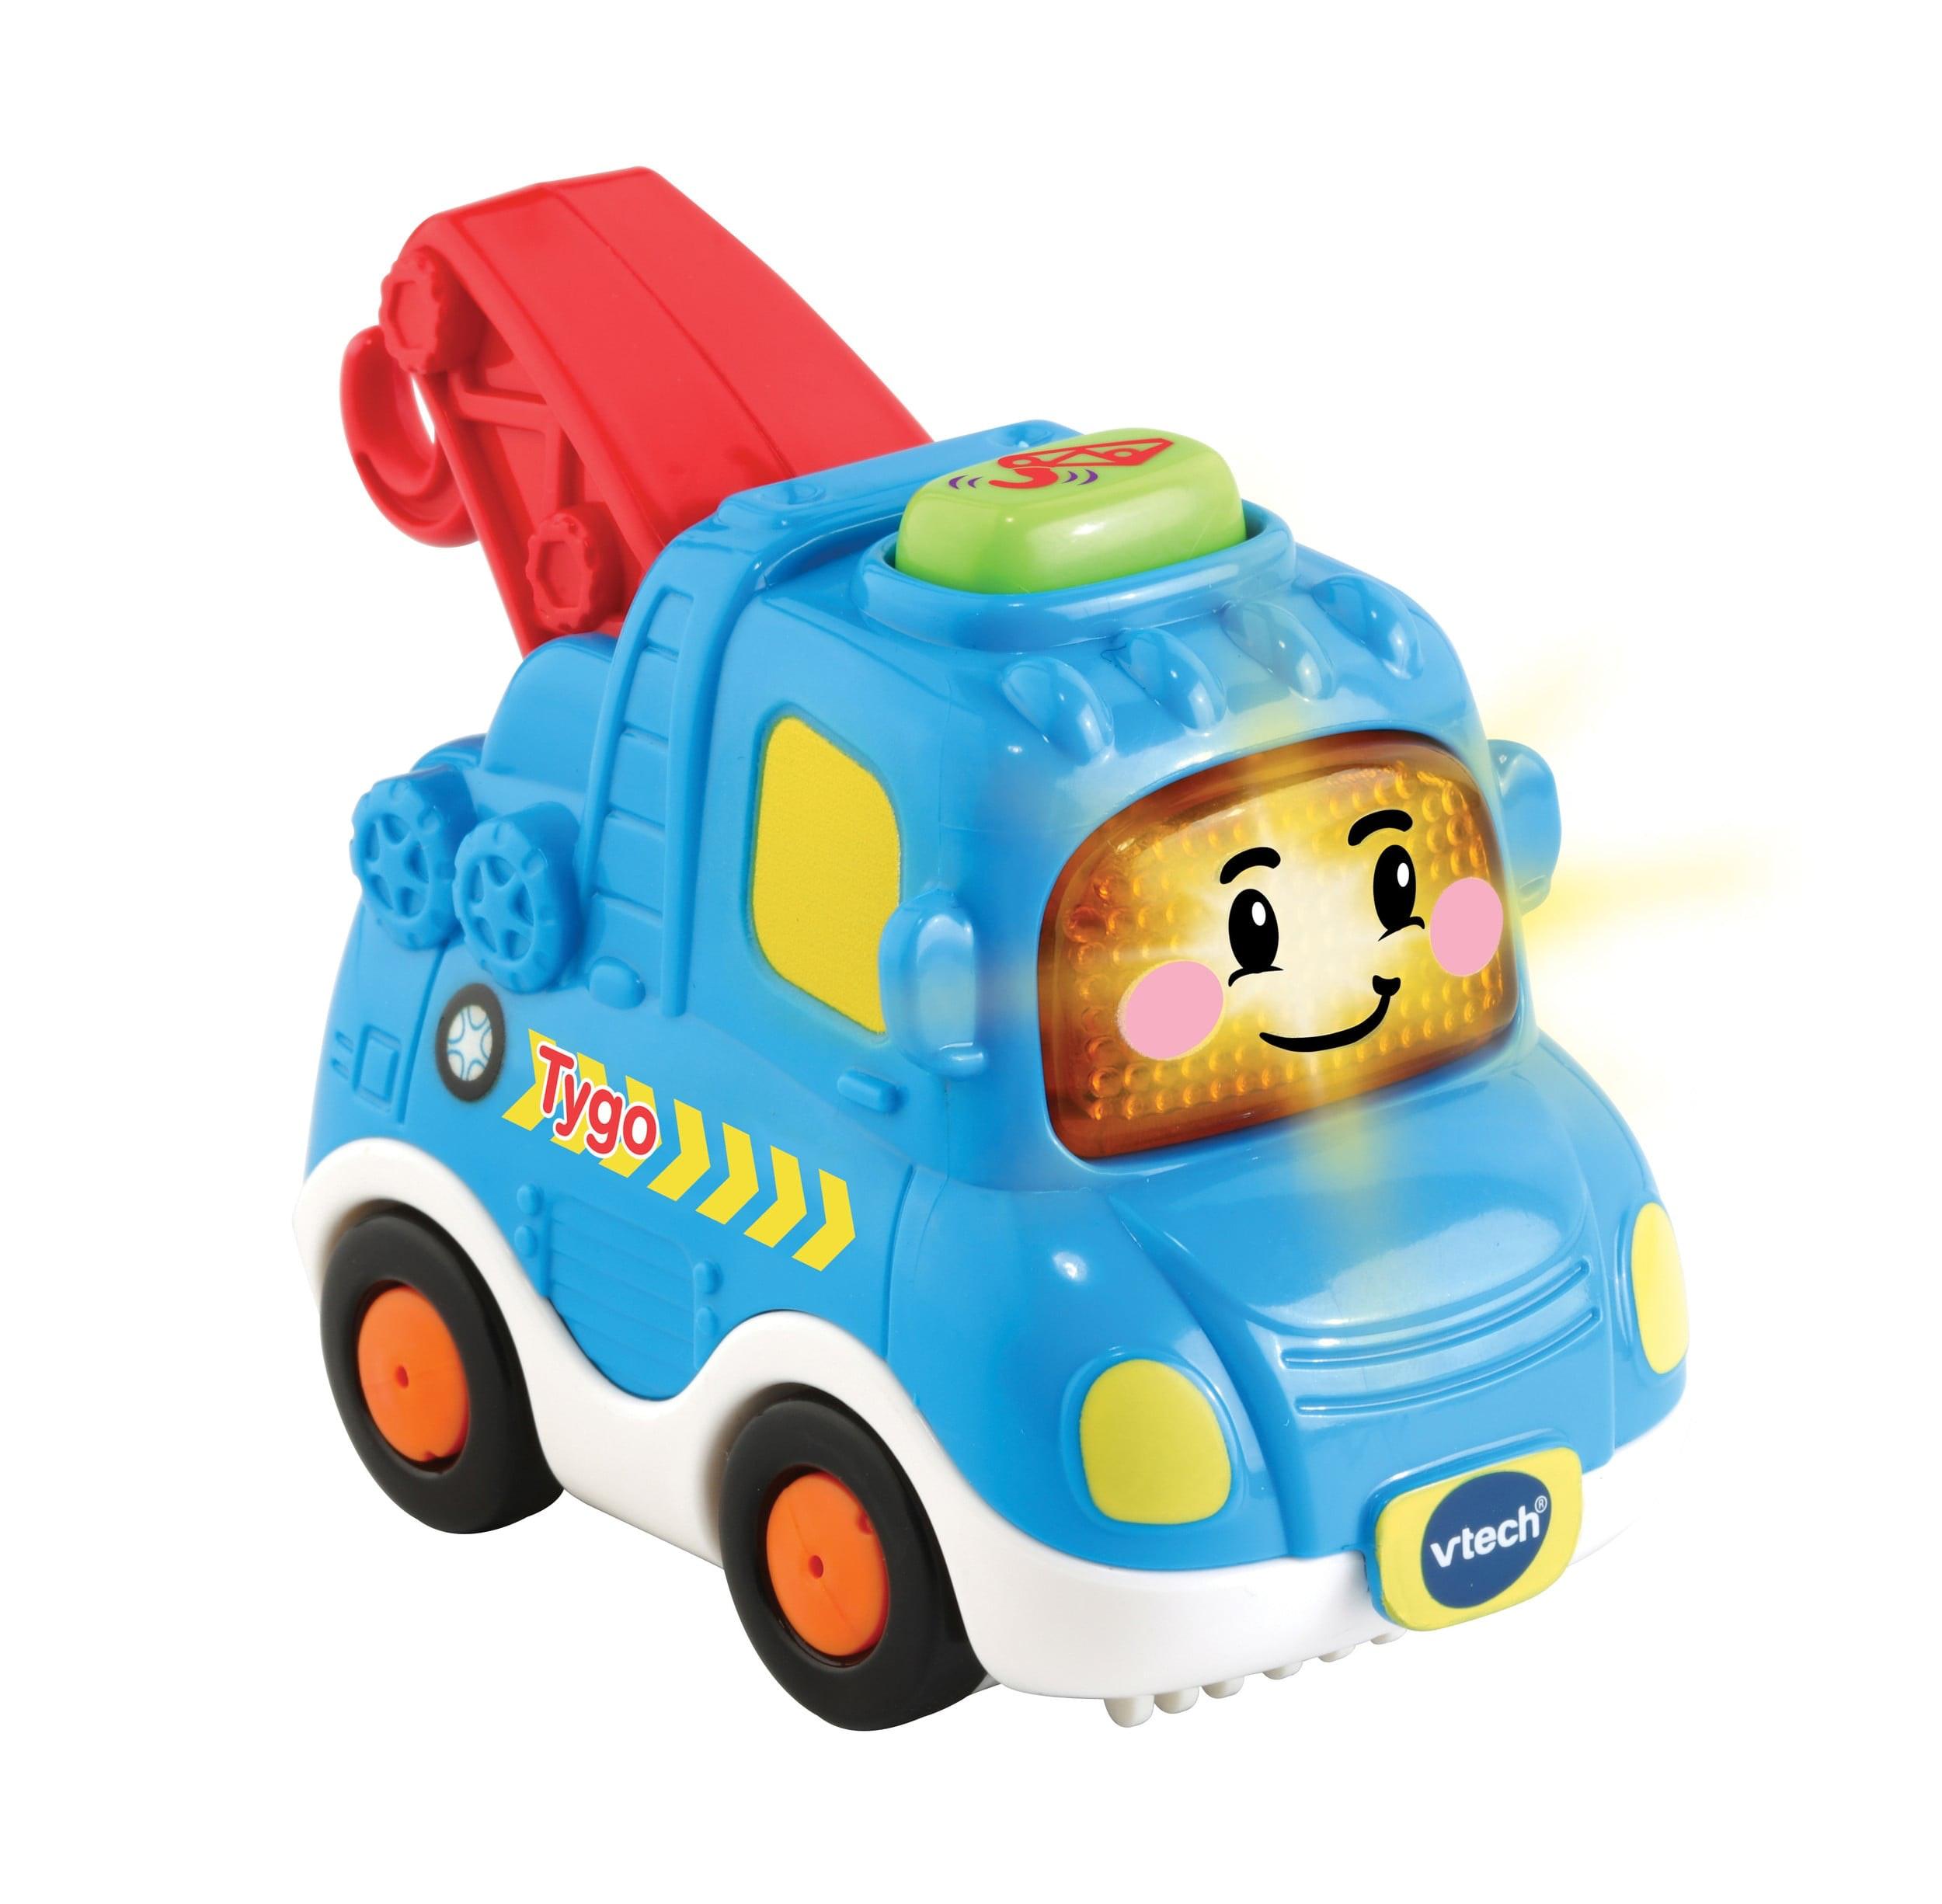 Vtech Toet Toet auto Tygo Takelwagen